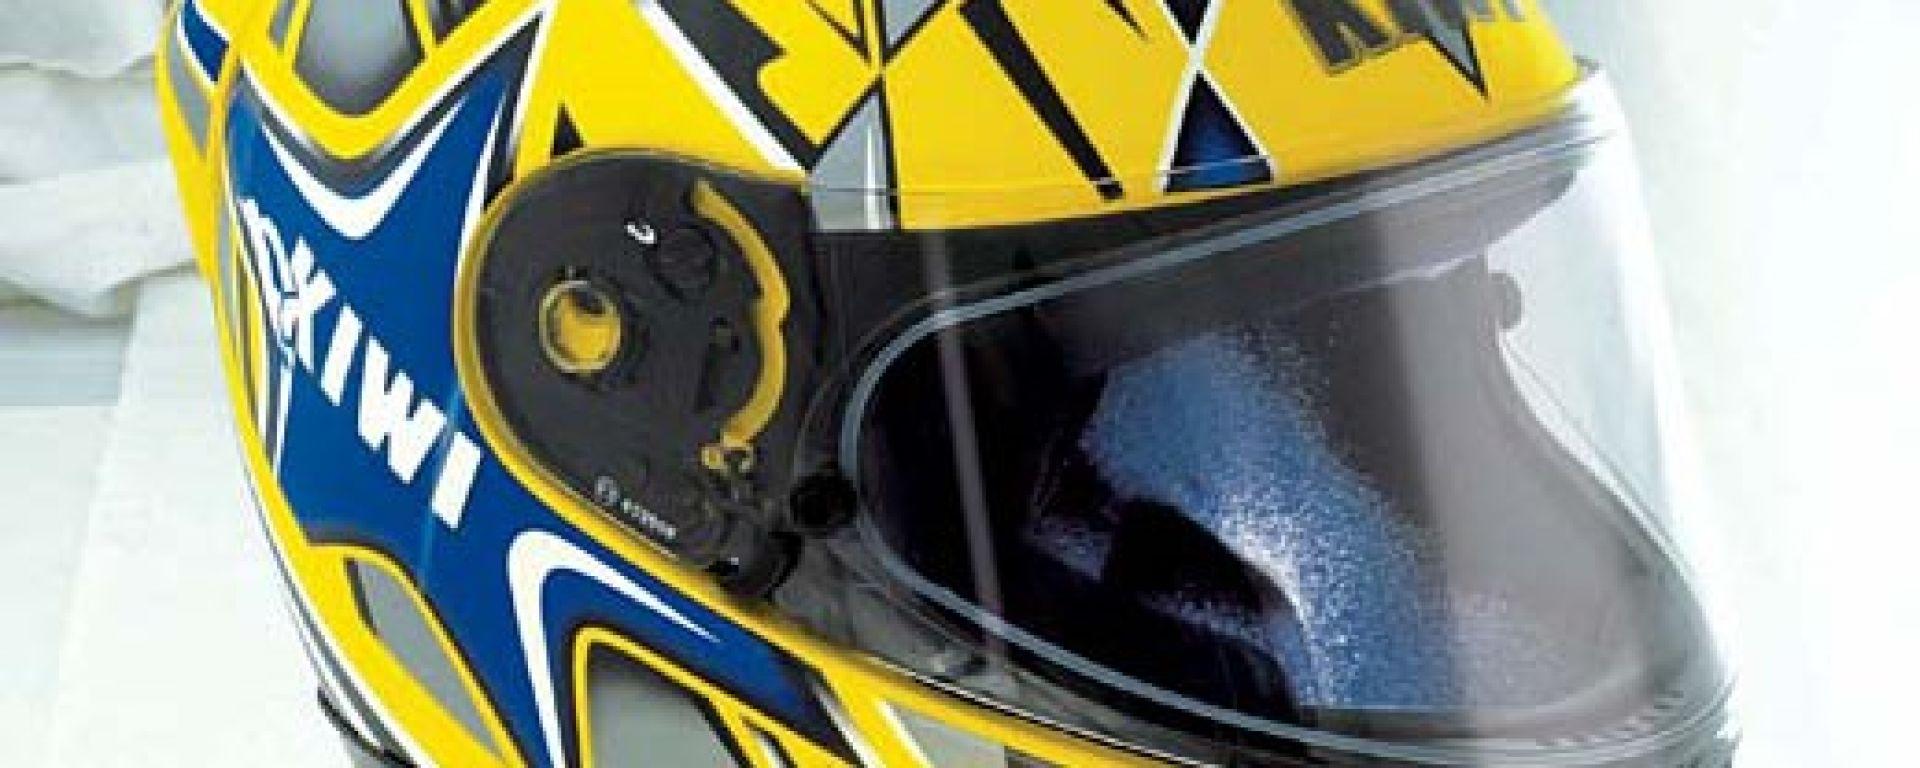 Provati da MotorBox: Kiwi K 500